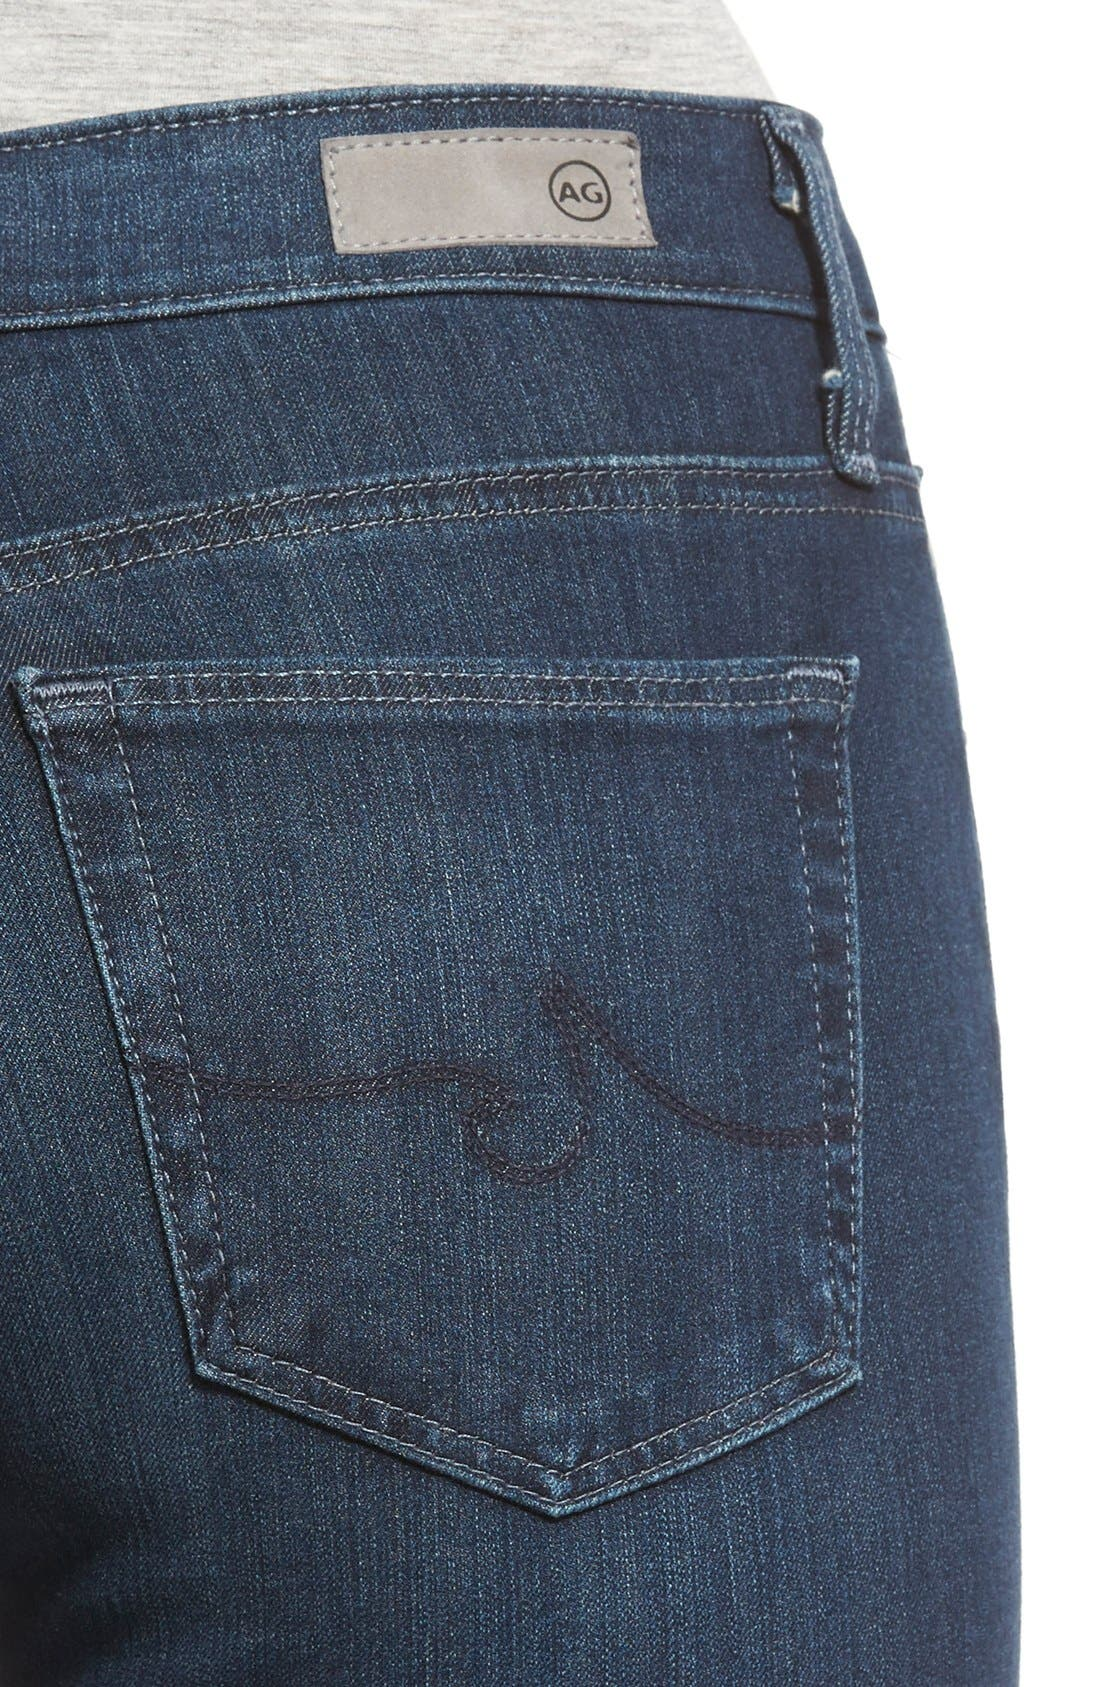 Alternate Image 4  - AG 'The Farrah' High Rise Skinny Jeans (Crater)